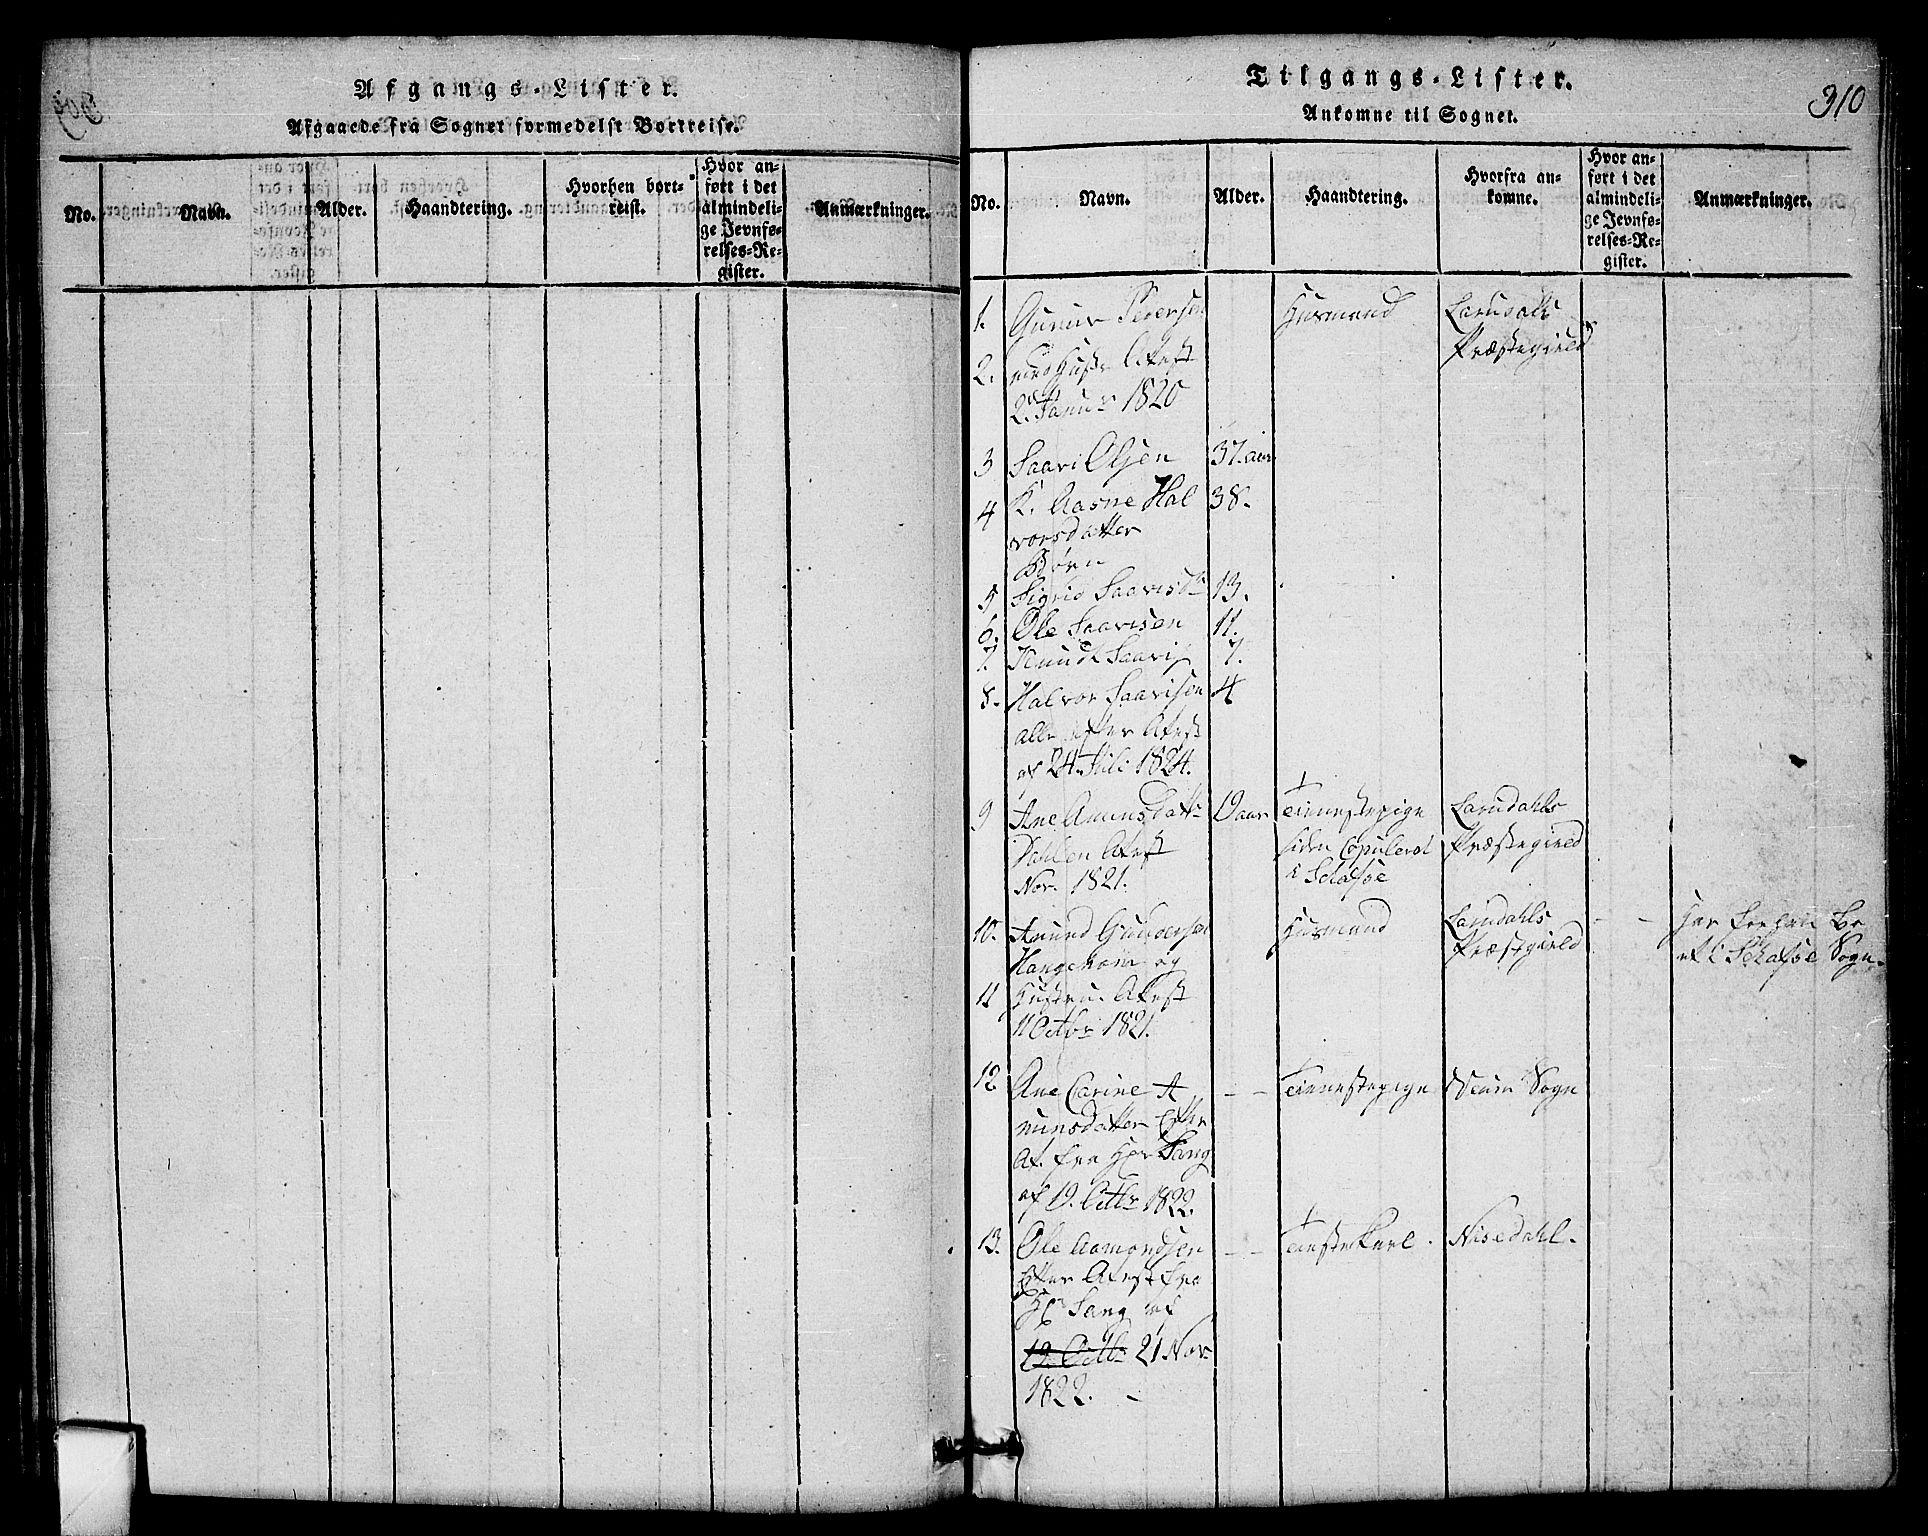 SAKO, Mo kirkebøker, G/Gb/L0001: Klokkerbok nr. II 1, 1814-1843, s. 310